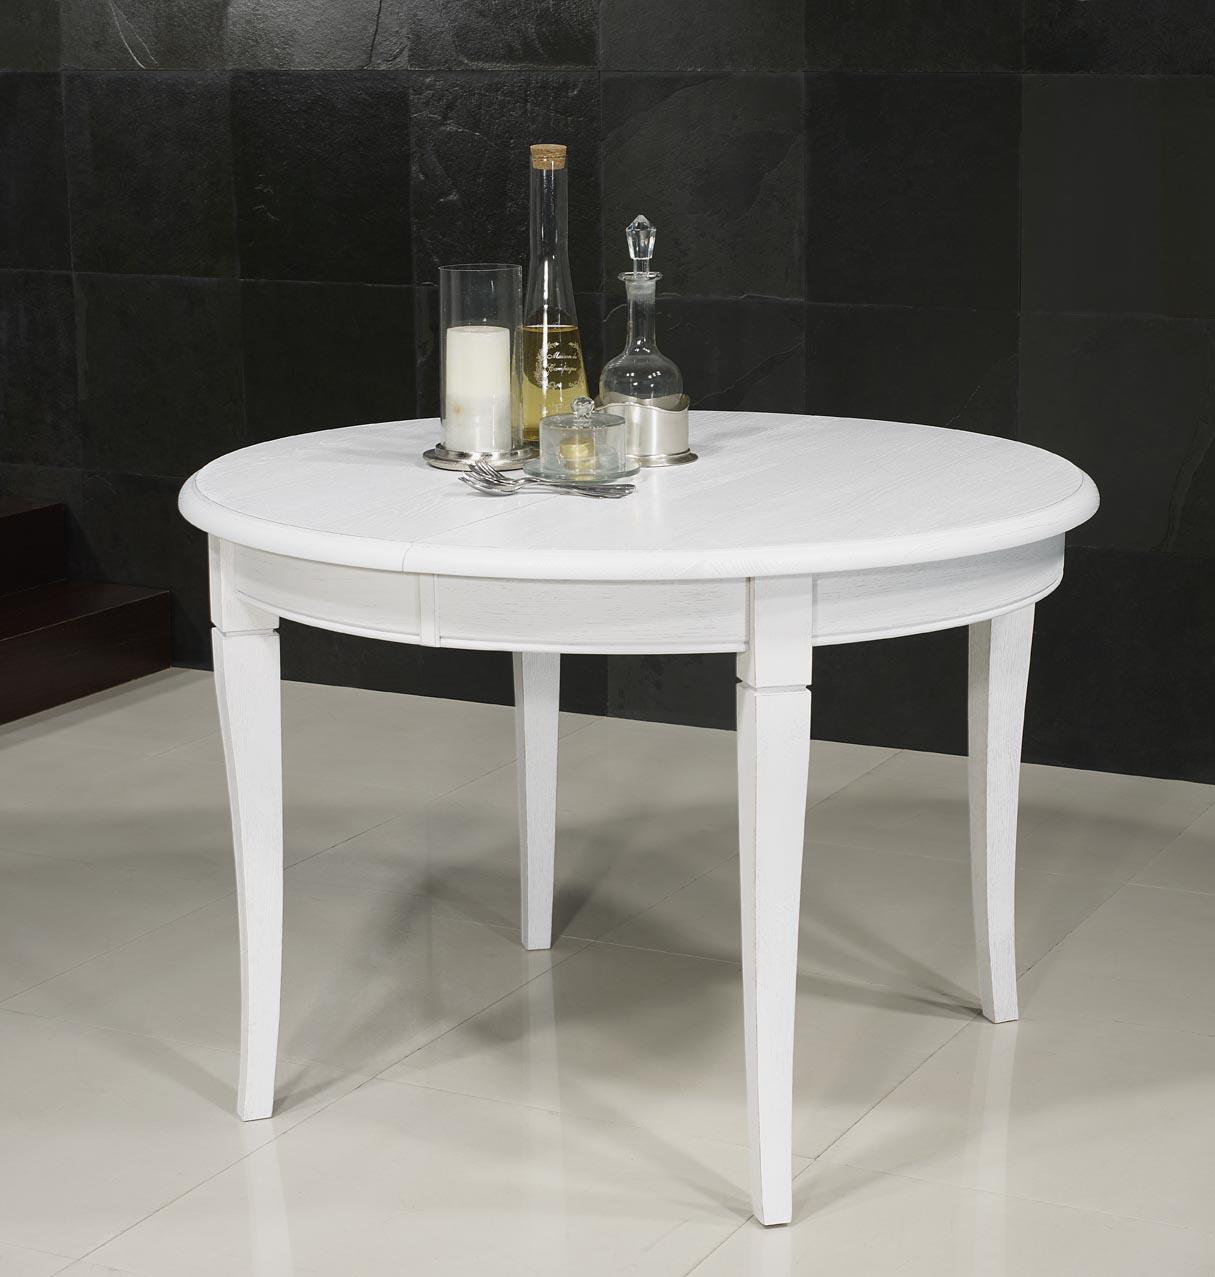 Table ronde en ch ne massif de style louis philippe - Table ronde style louis philippe ...